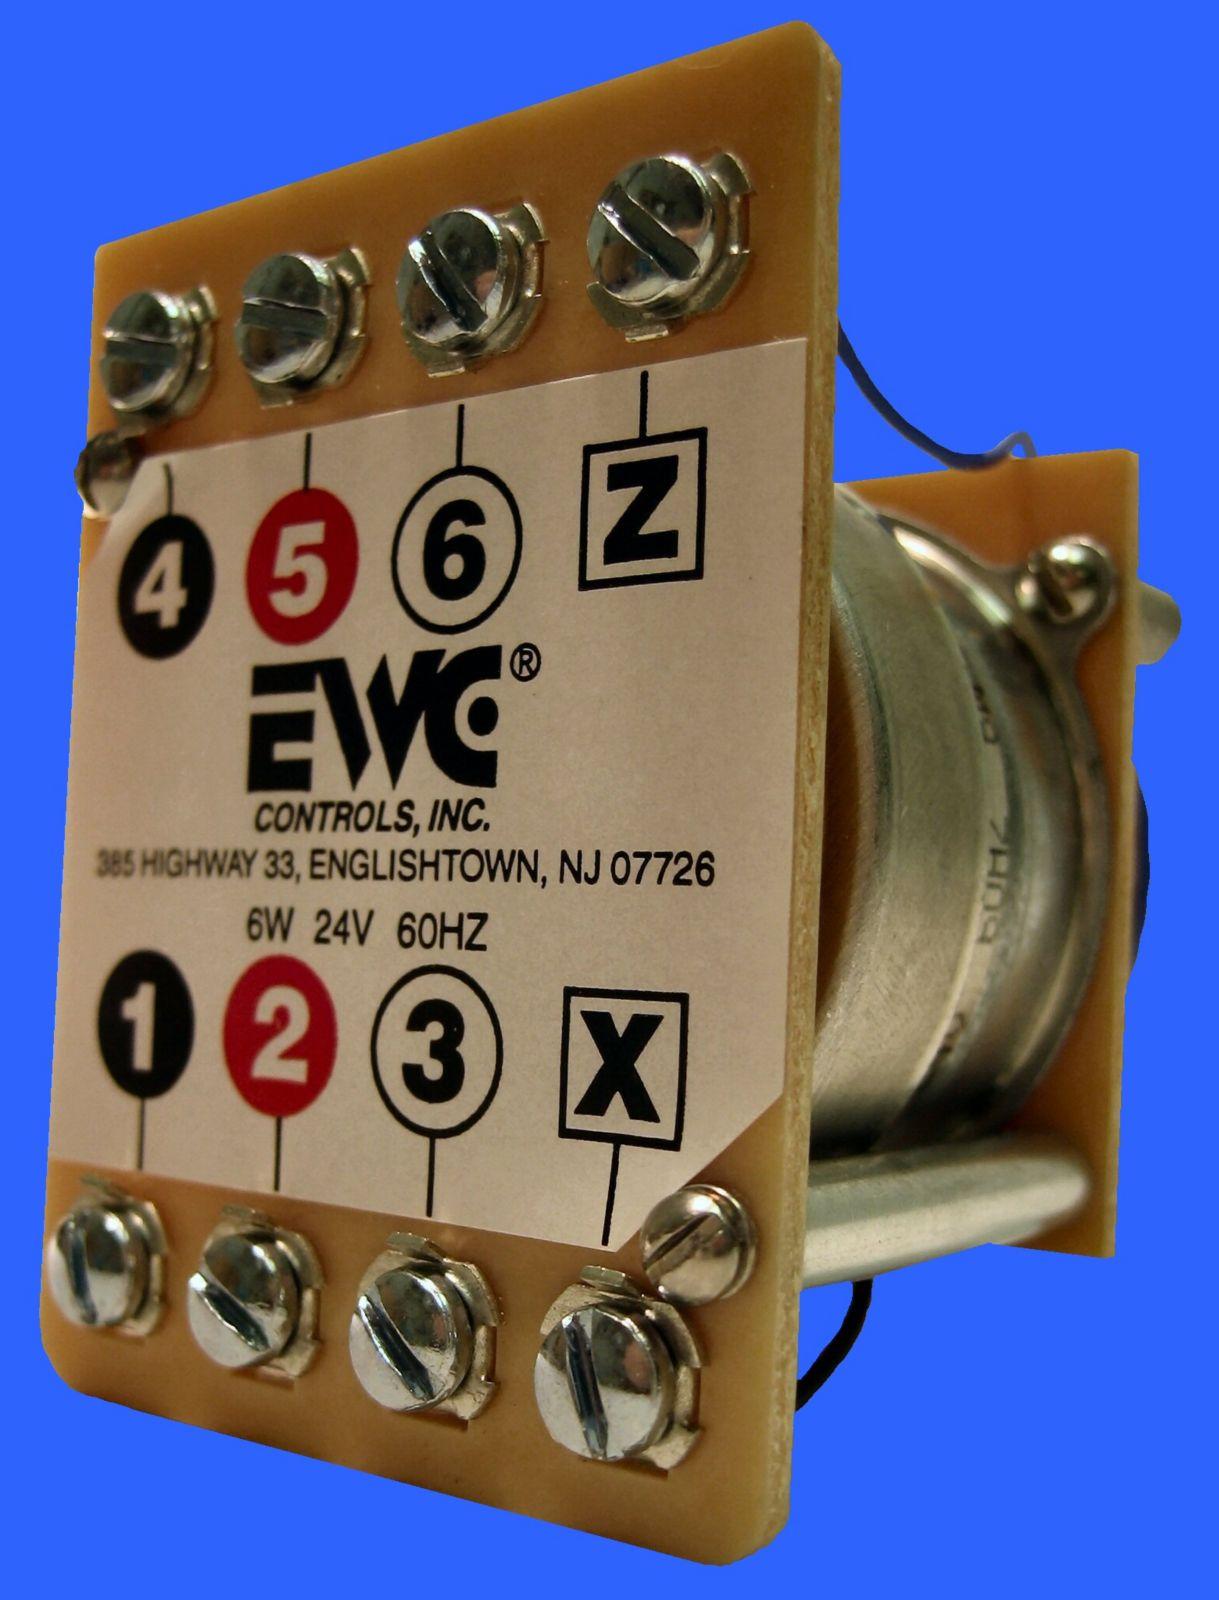 Man Motor Replacement (SMD/BMD Damper) | Carrier HVAC